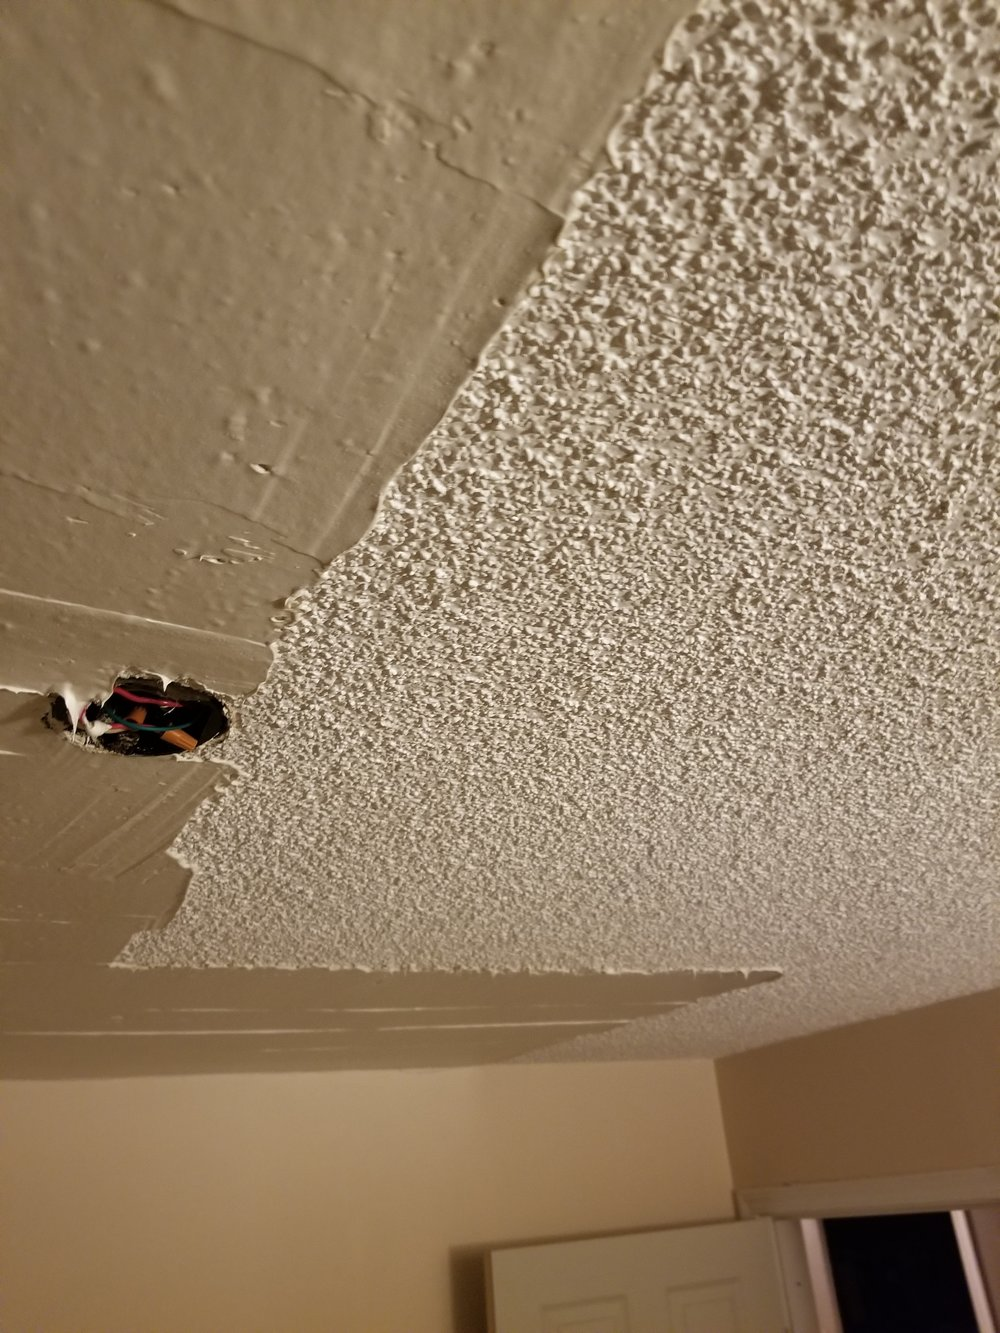 Custom Drywall Popcorn Ceiling Removal (1).jpg